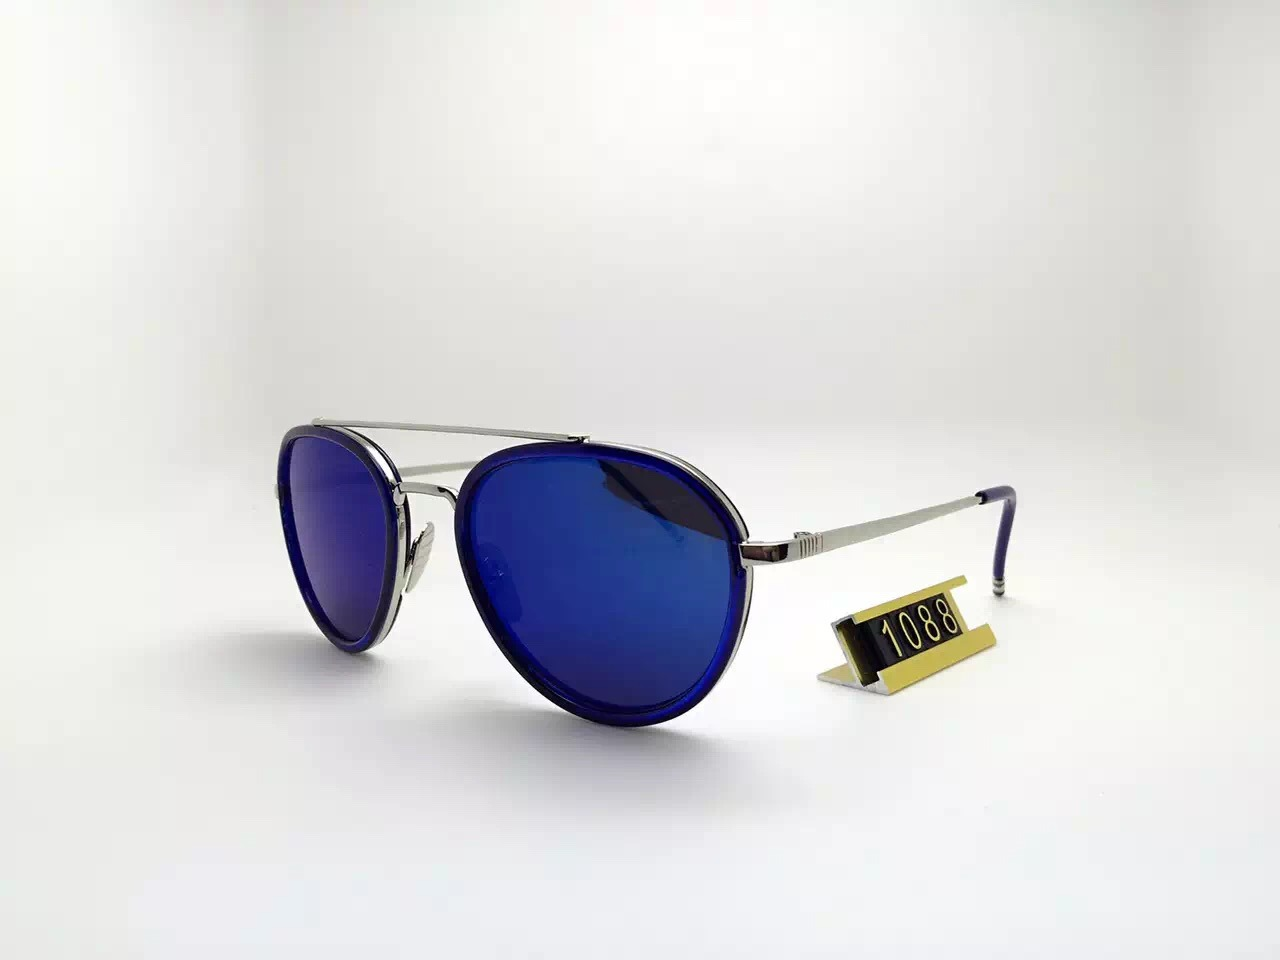 Oculos De Sol Polarizado Discovery   United Nations System Chief ... 2315579cff